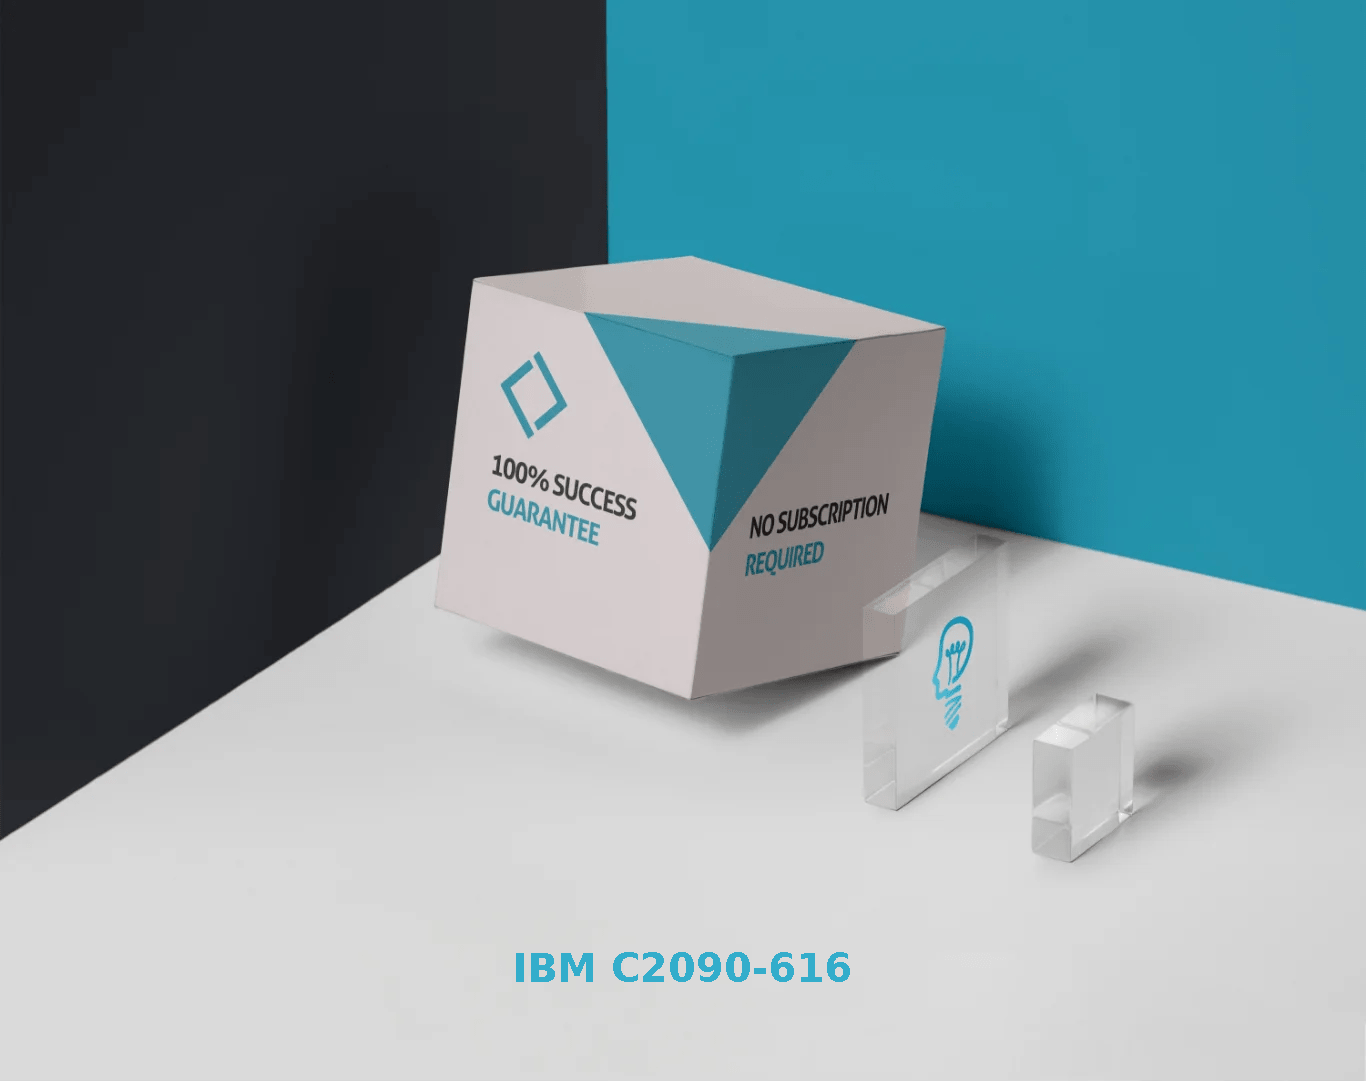 IBM C2090-616 Exams